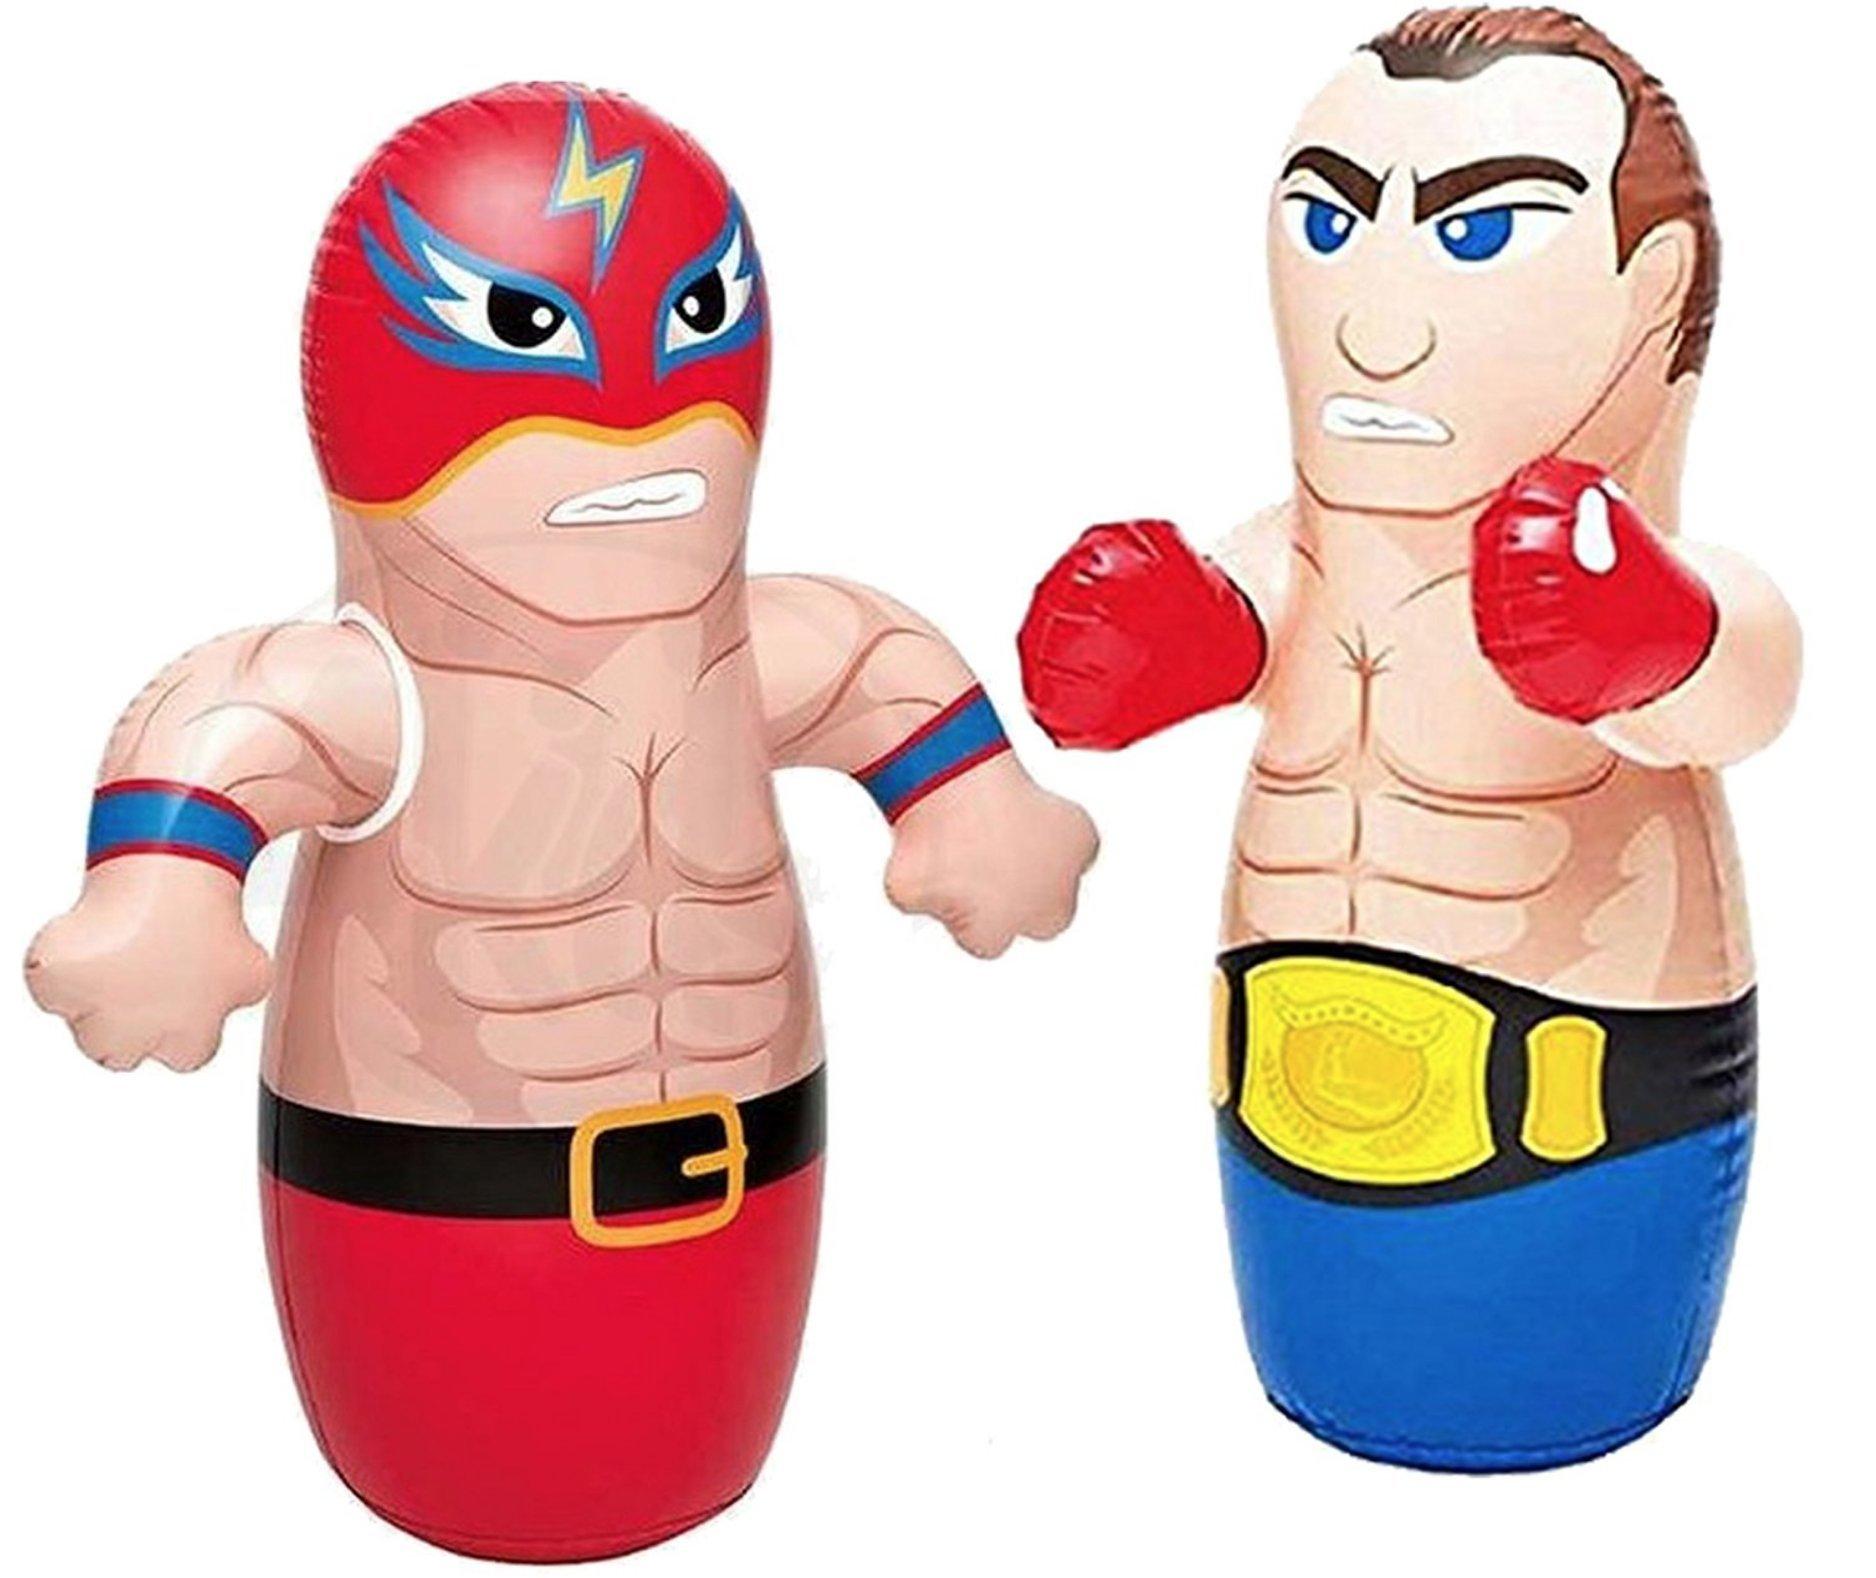 36'' 2 Pack 3-D Bop Bag Masked Wrestler and Boxer - MMA Fighter Wrestling Kick Boxing Tackle Buddy Punching Bop Bag Fun Kids Indoor Outdoor Toy